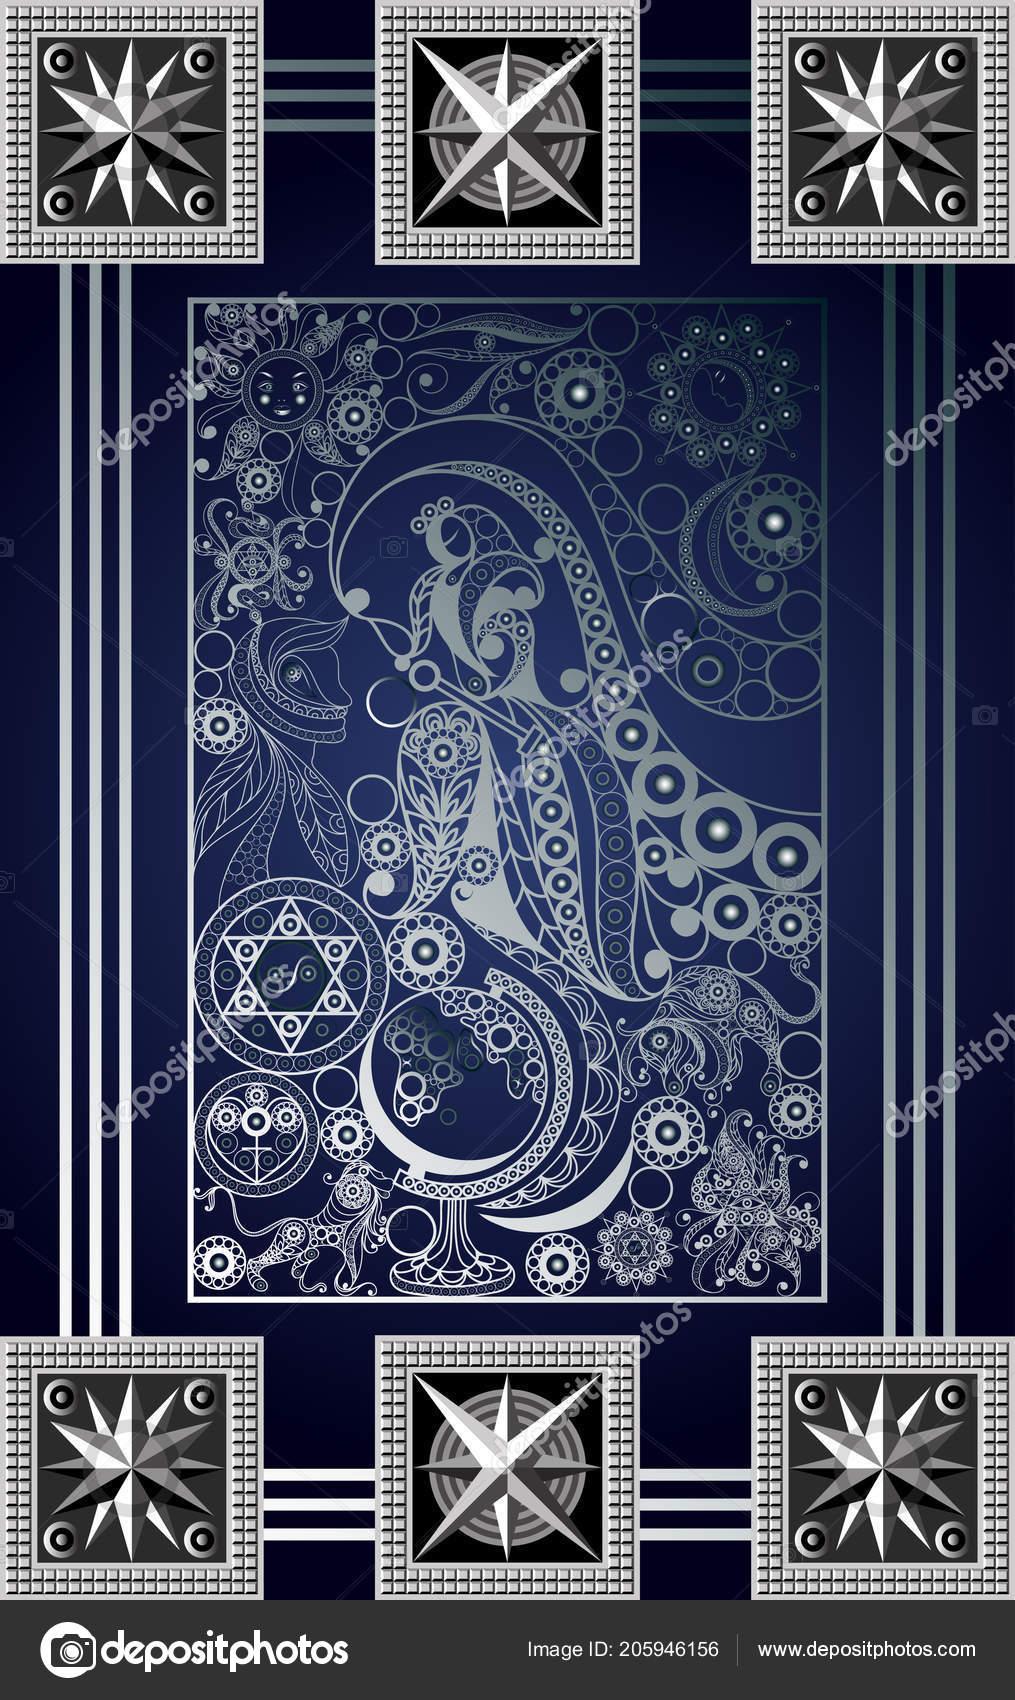 Graphic Abstract Design Occult Tarot Card Major Arcana